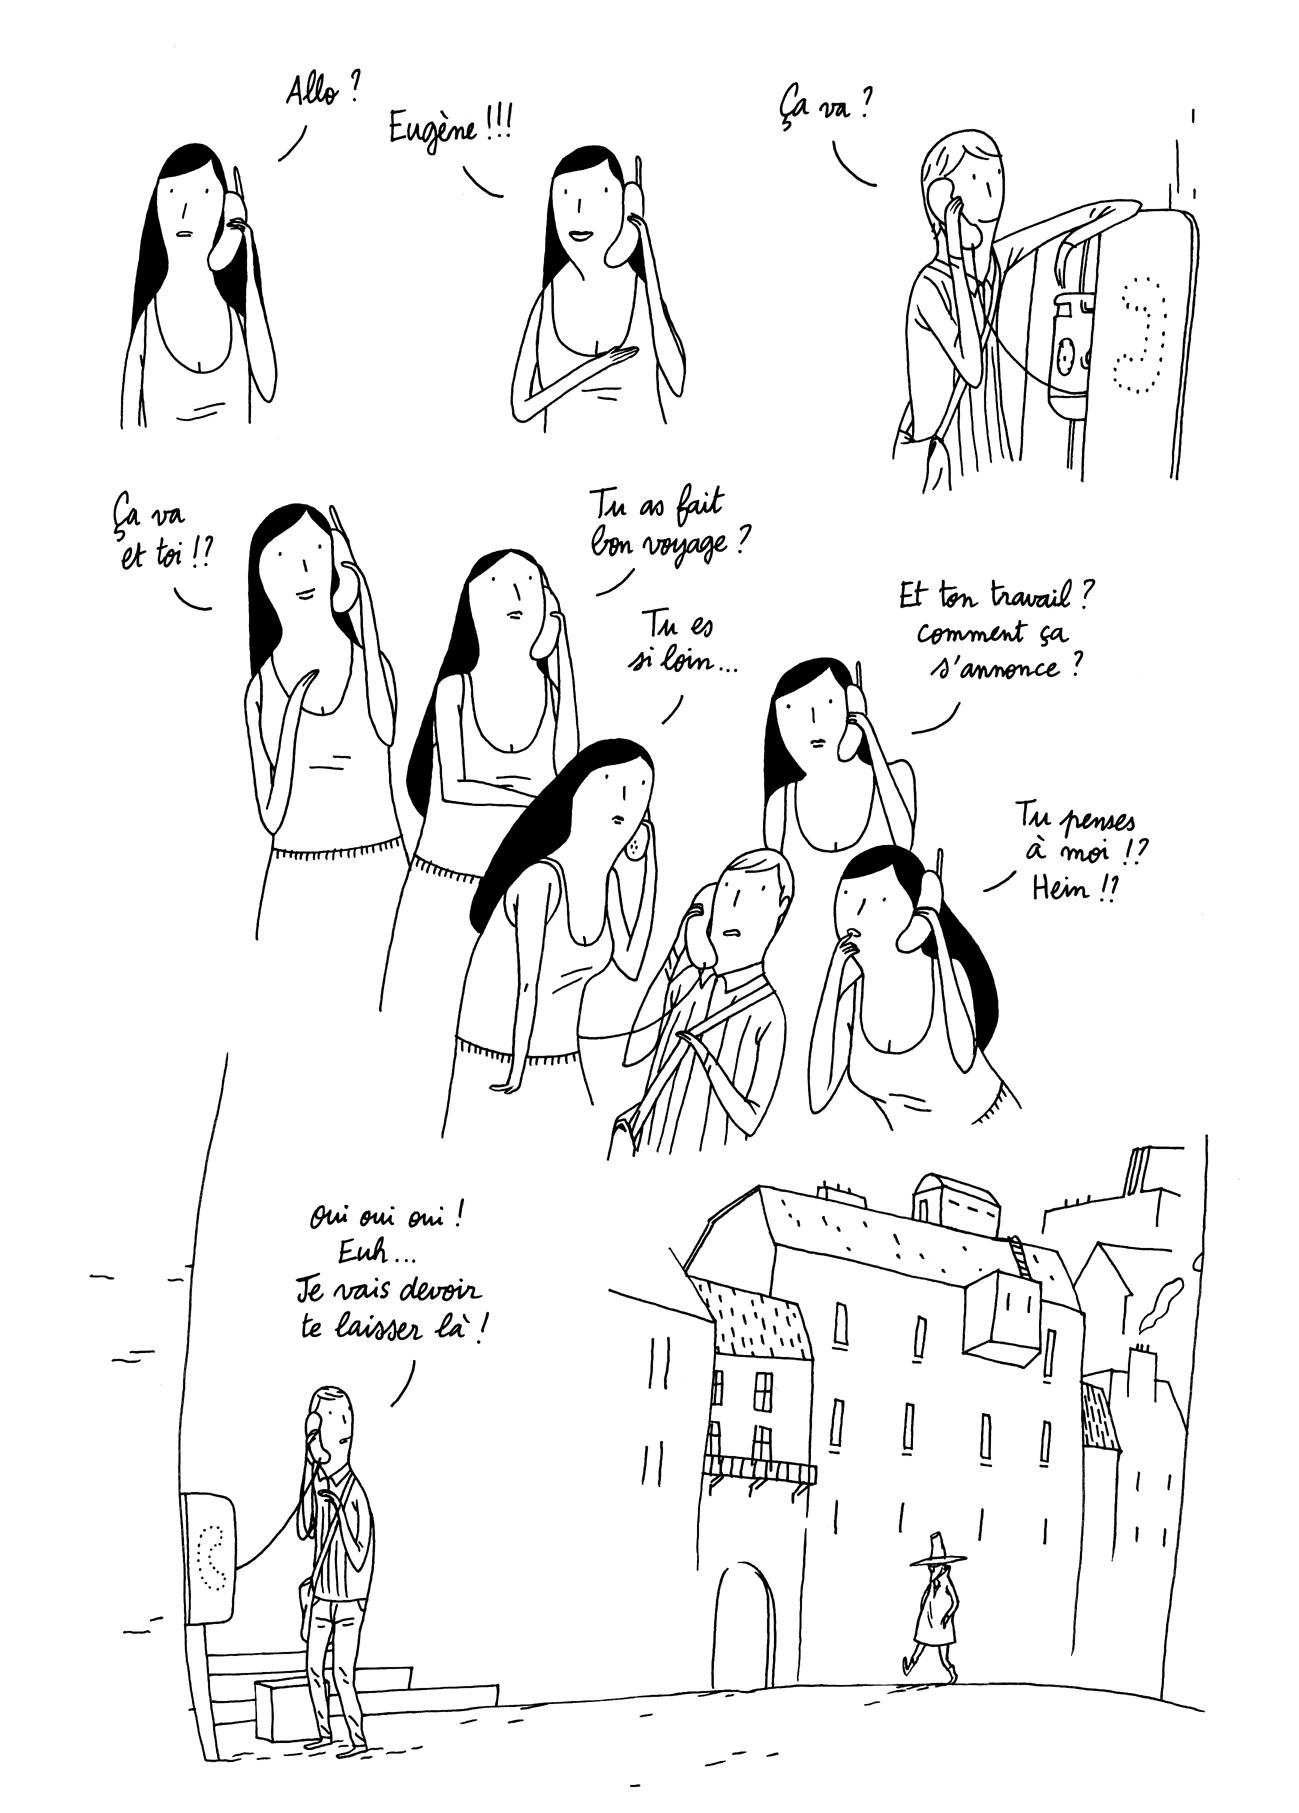 extrait 3   Bande dessinée   Eugène